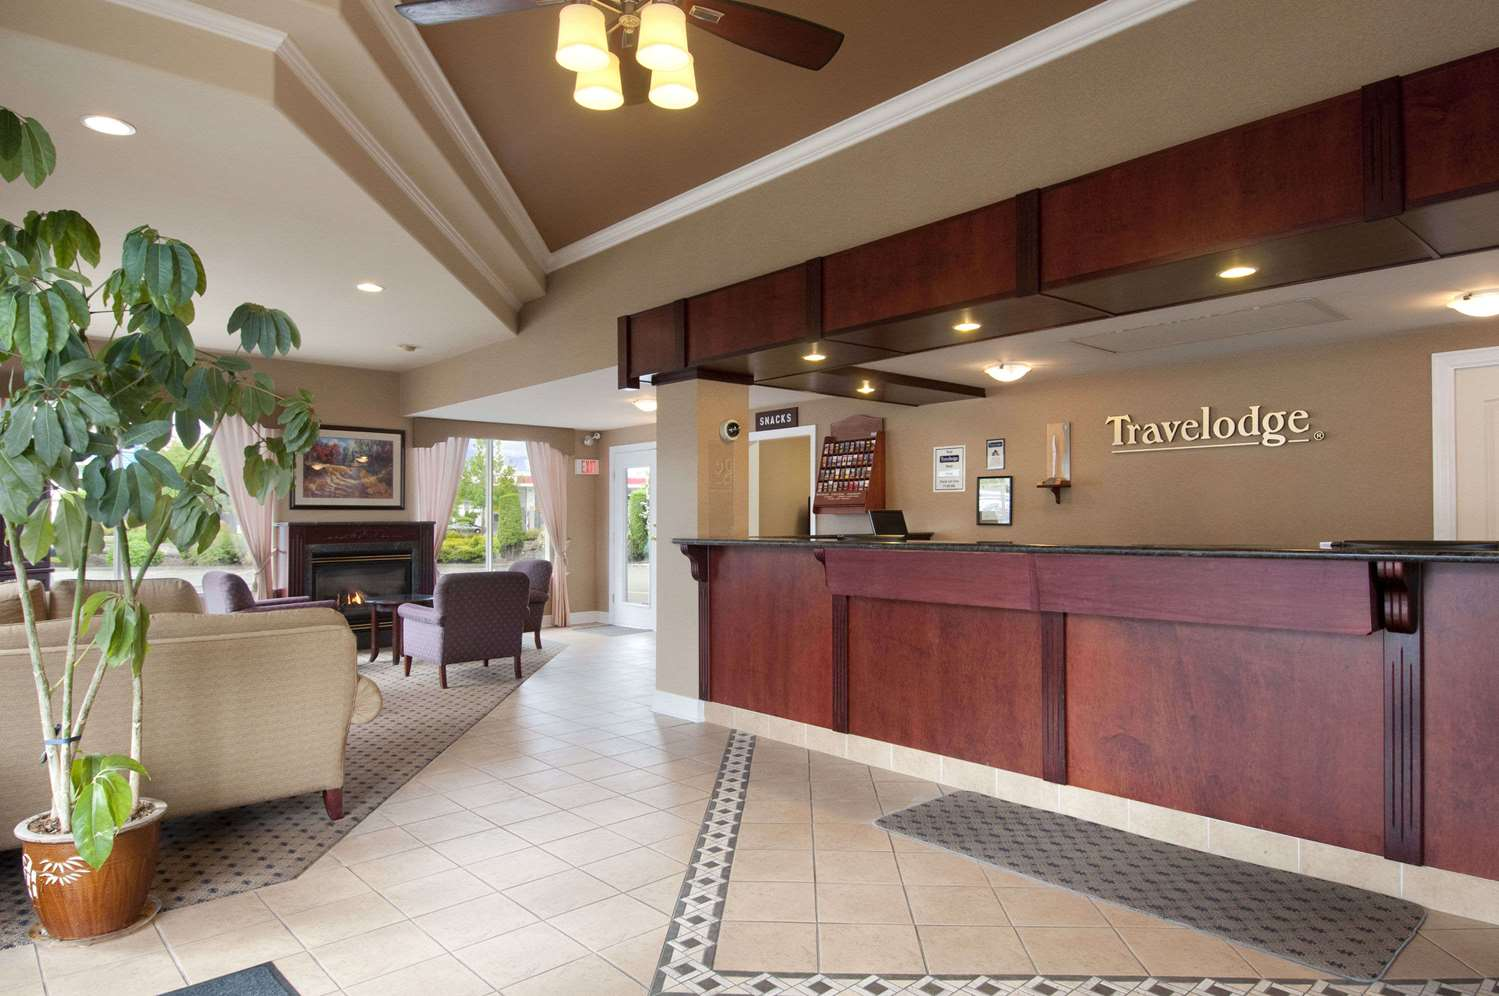 Lobby - Travelodge Fraser Highway Langley